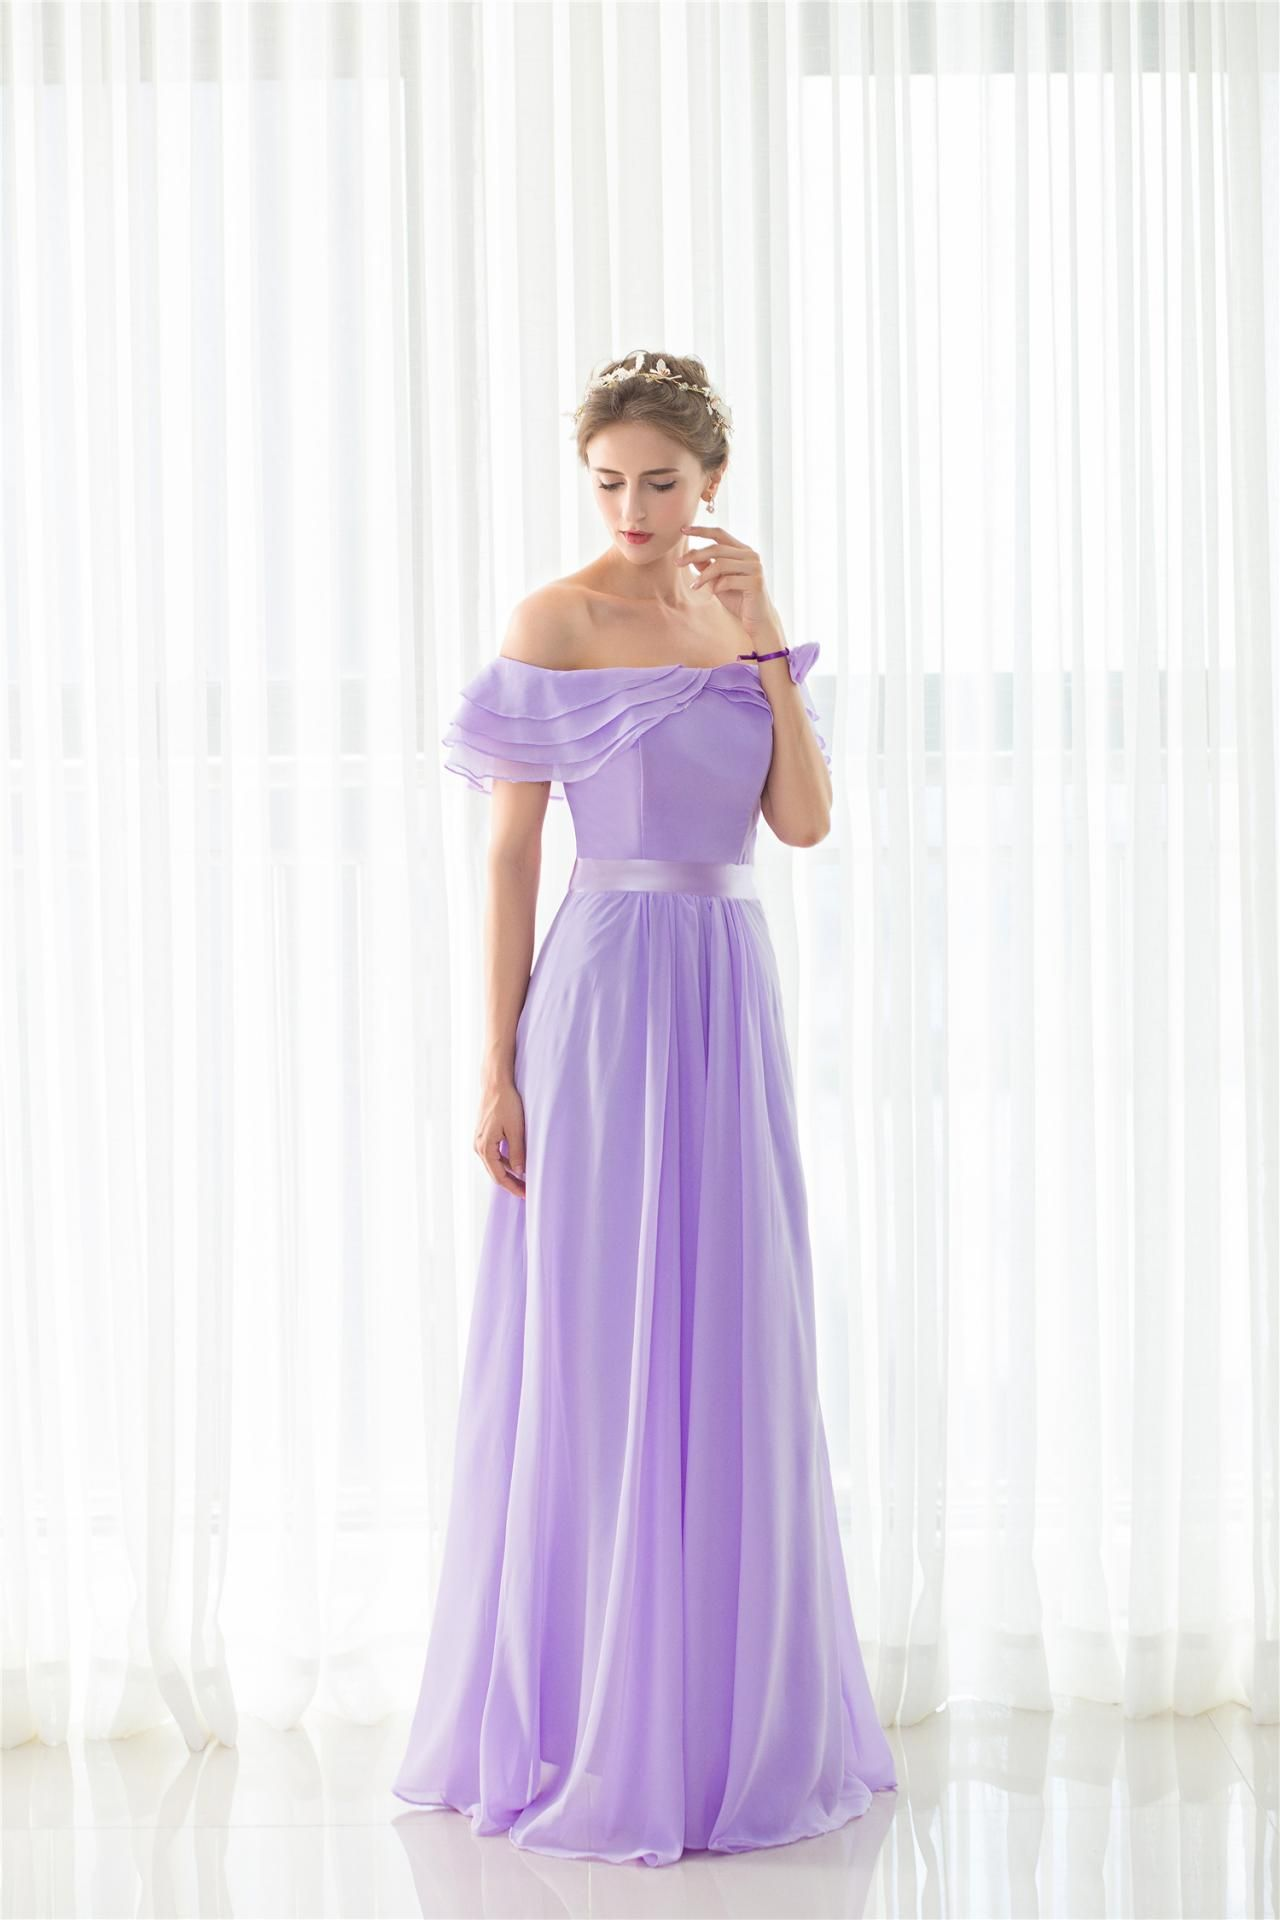 Lavender bridesmaid dressesstrapless maid of honor dress